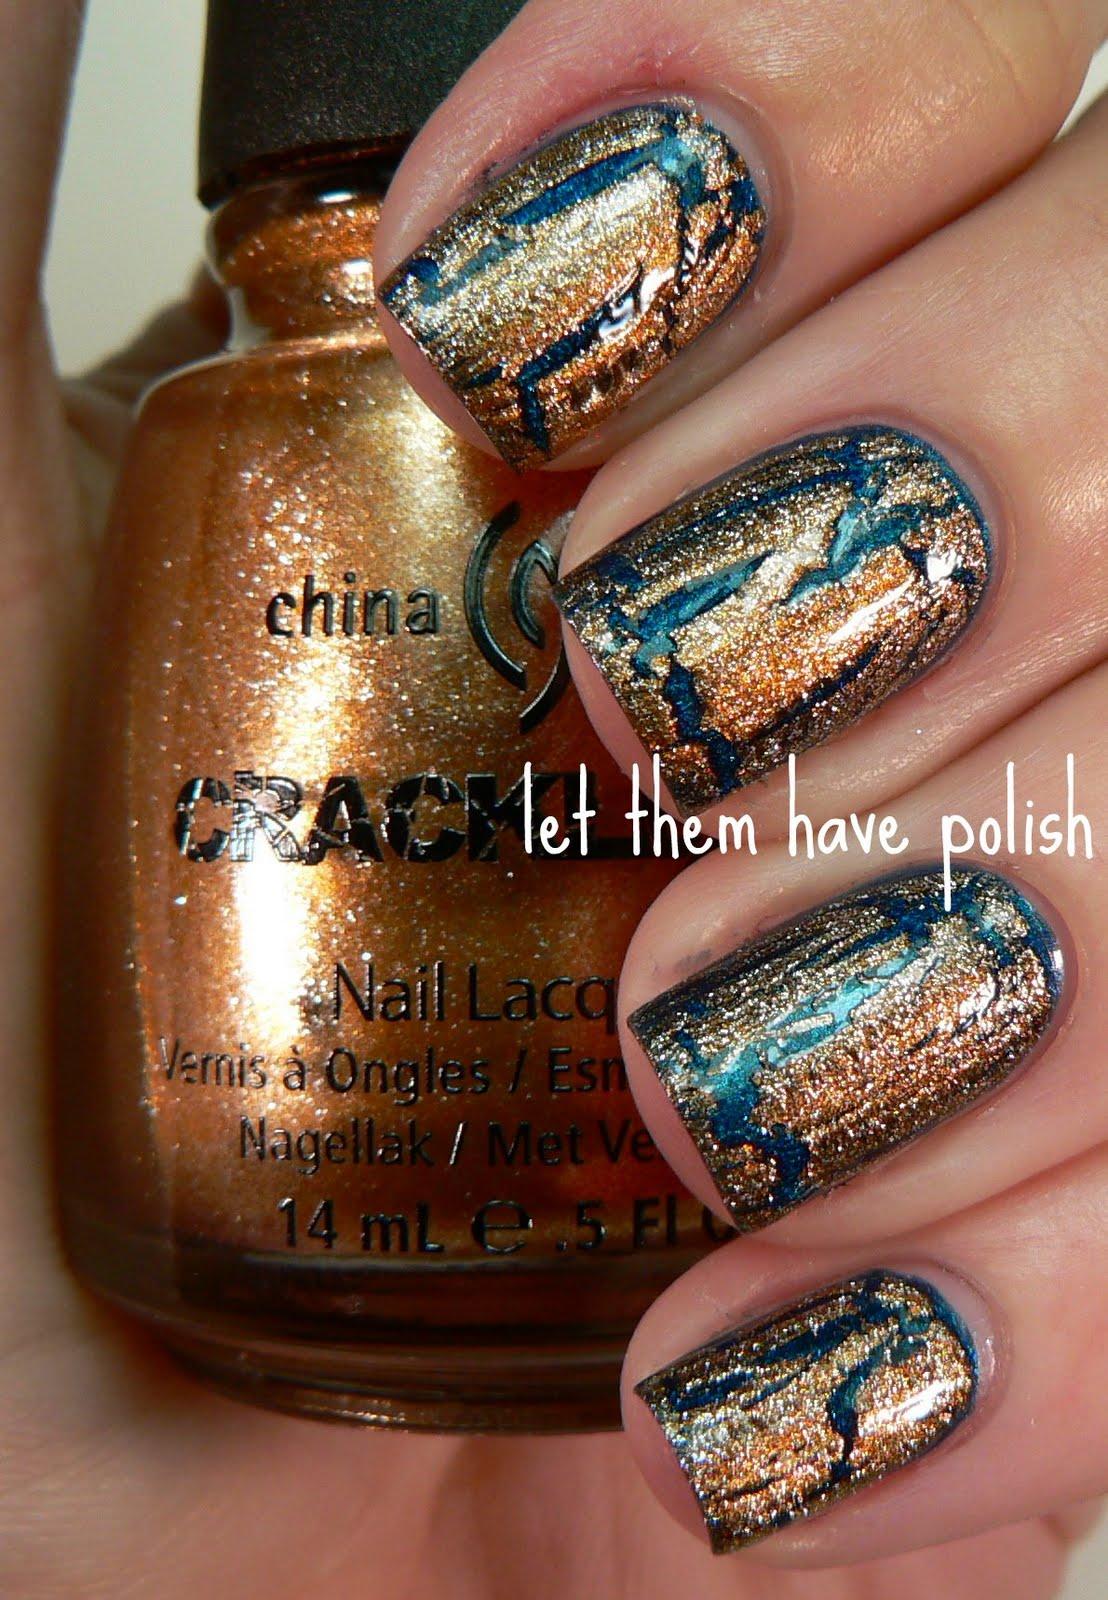 China Glaze Presenta Crakle Glaze: Let Them Have Polish!: Some China Glaze Metallic Crackle